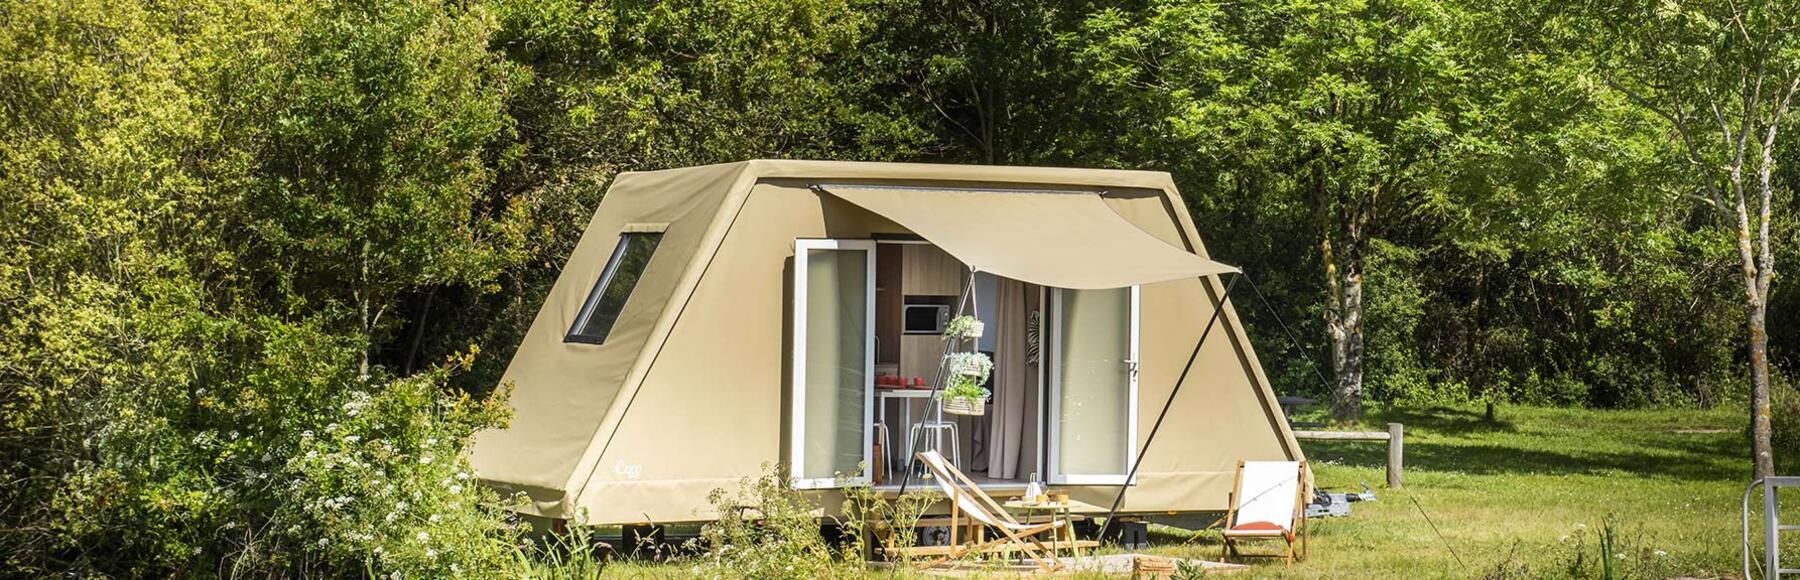 elbadoc-campingvillage it tende-attrezzate 005